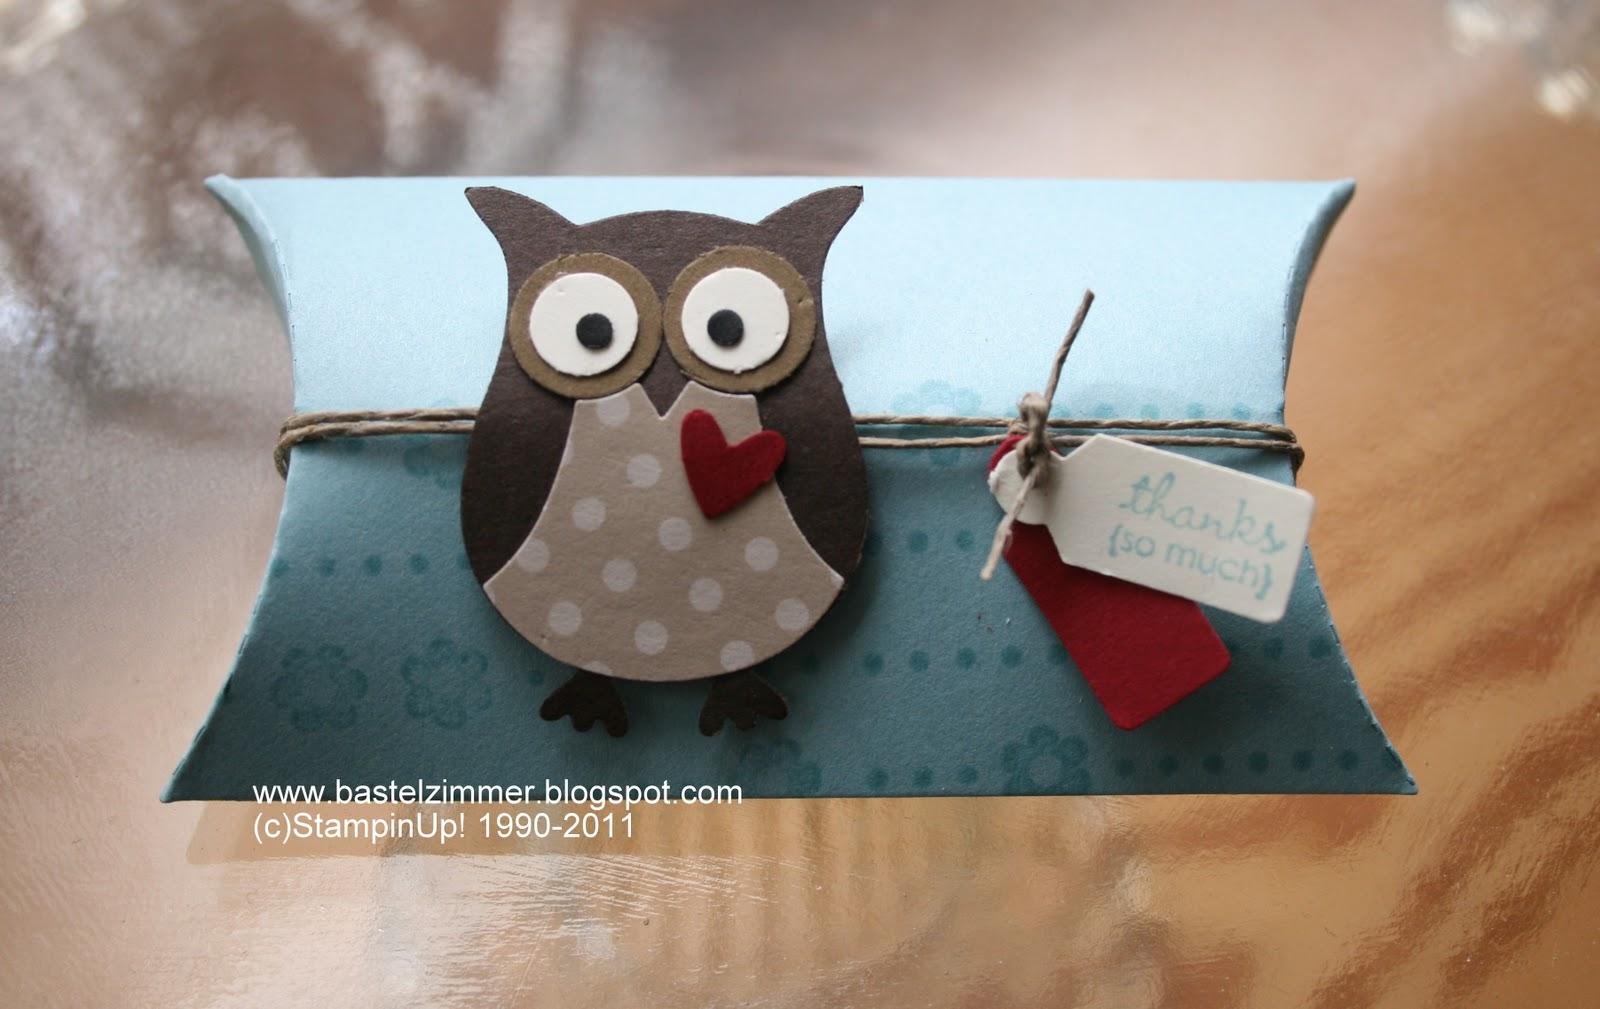 Pillow Box Basteln stin up ideen anleitungen und produkte bestellen 05841 1505